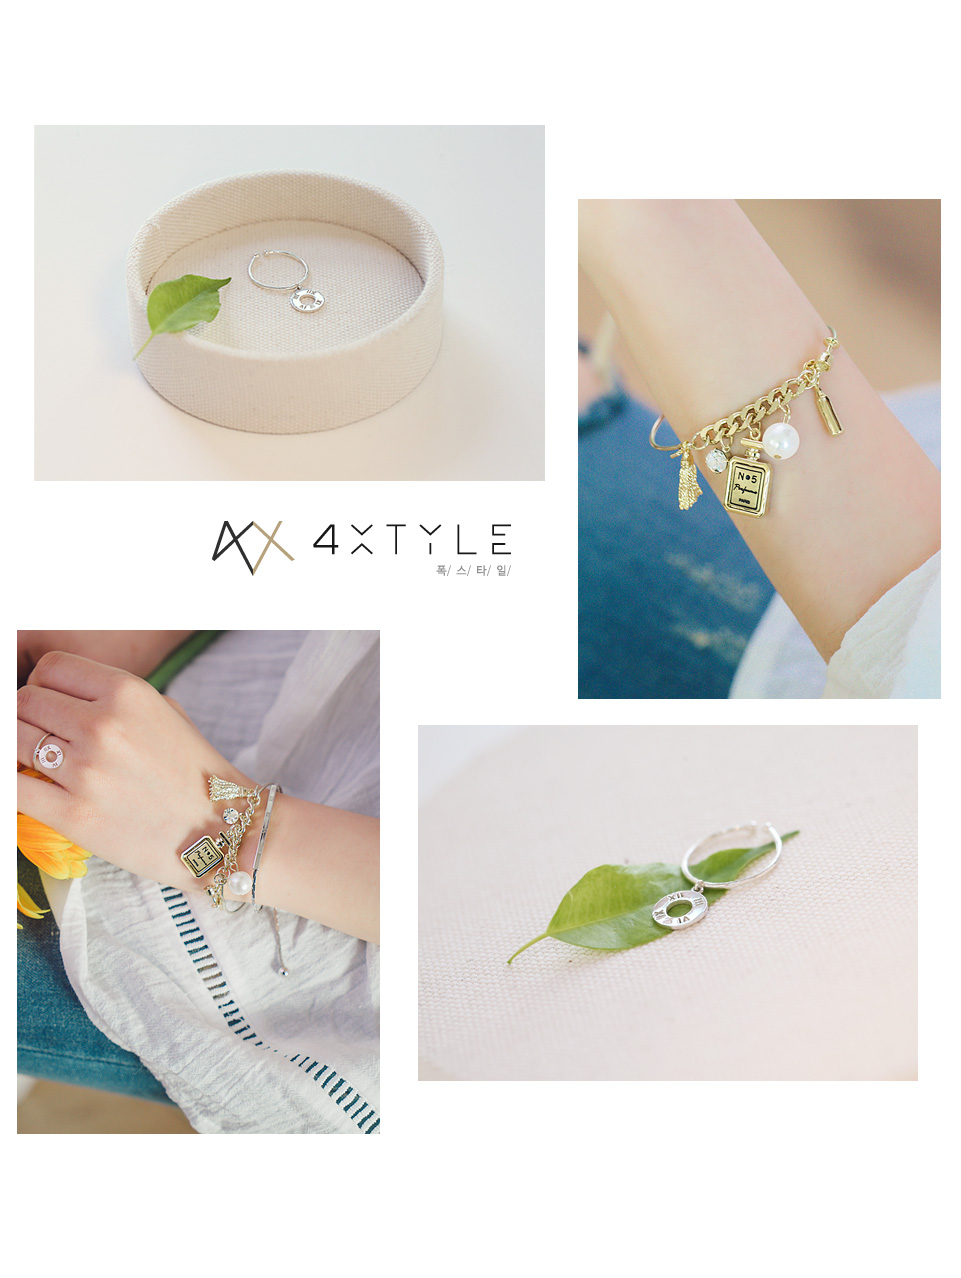 [ 4xtyle ] [银]简装 DONUT 环形